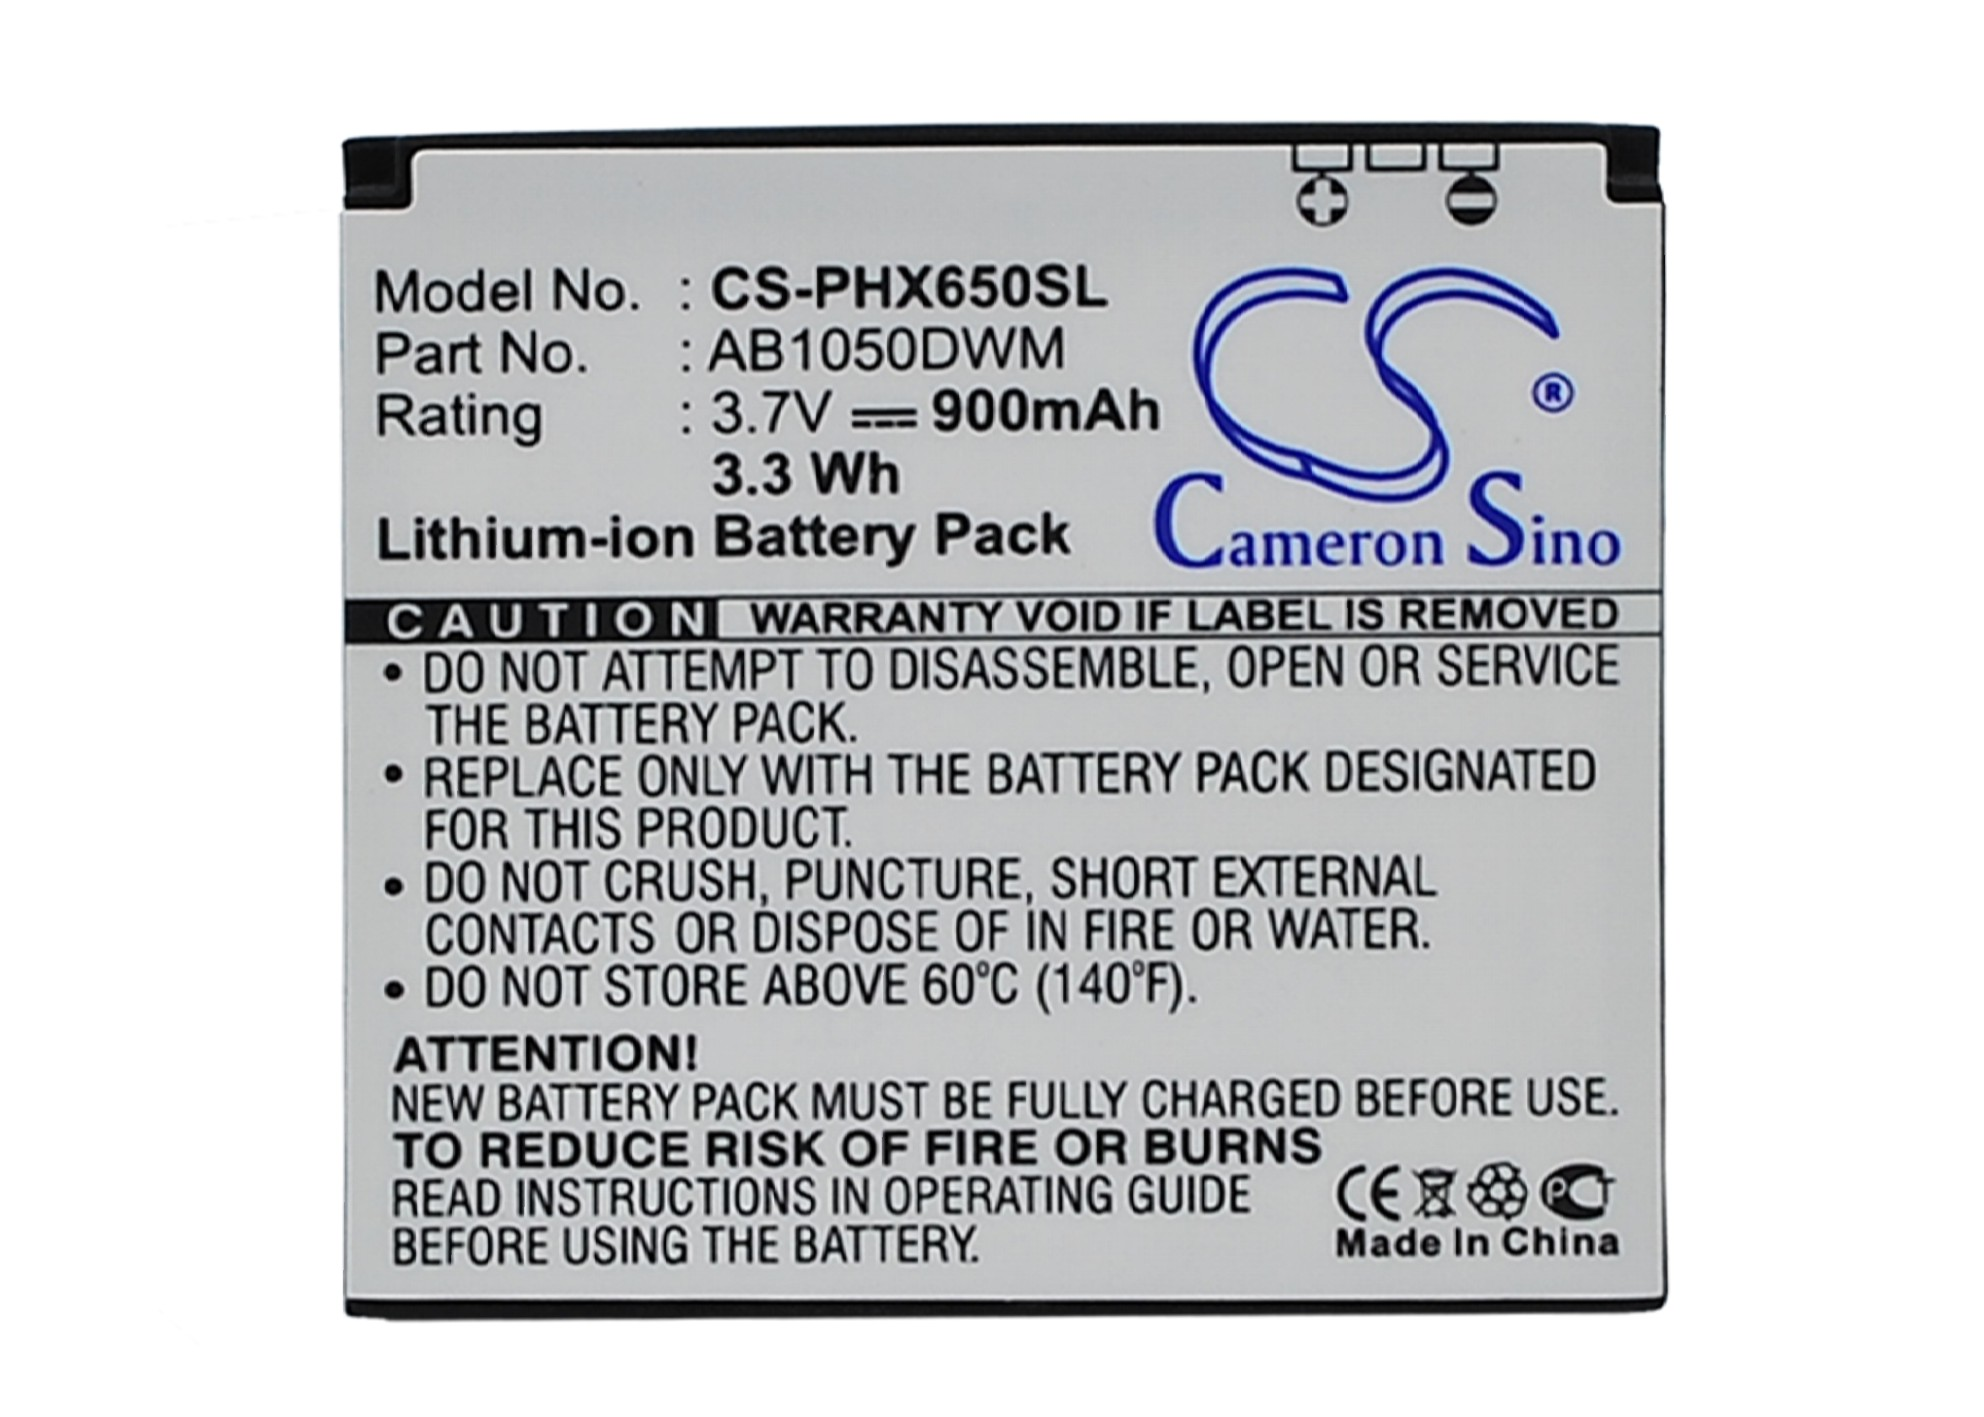 Cameron Sino baterie do mobilů pro PHILIPS Xenium X510 3.7V Li-ion 900mAh černá - neoriginální